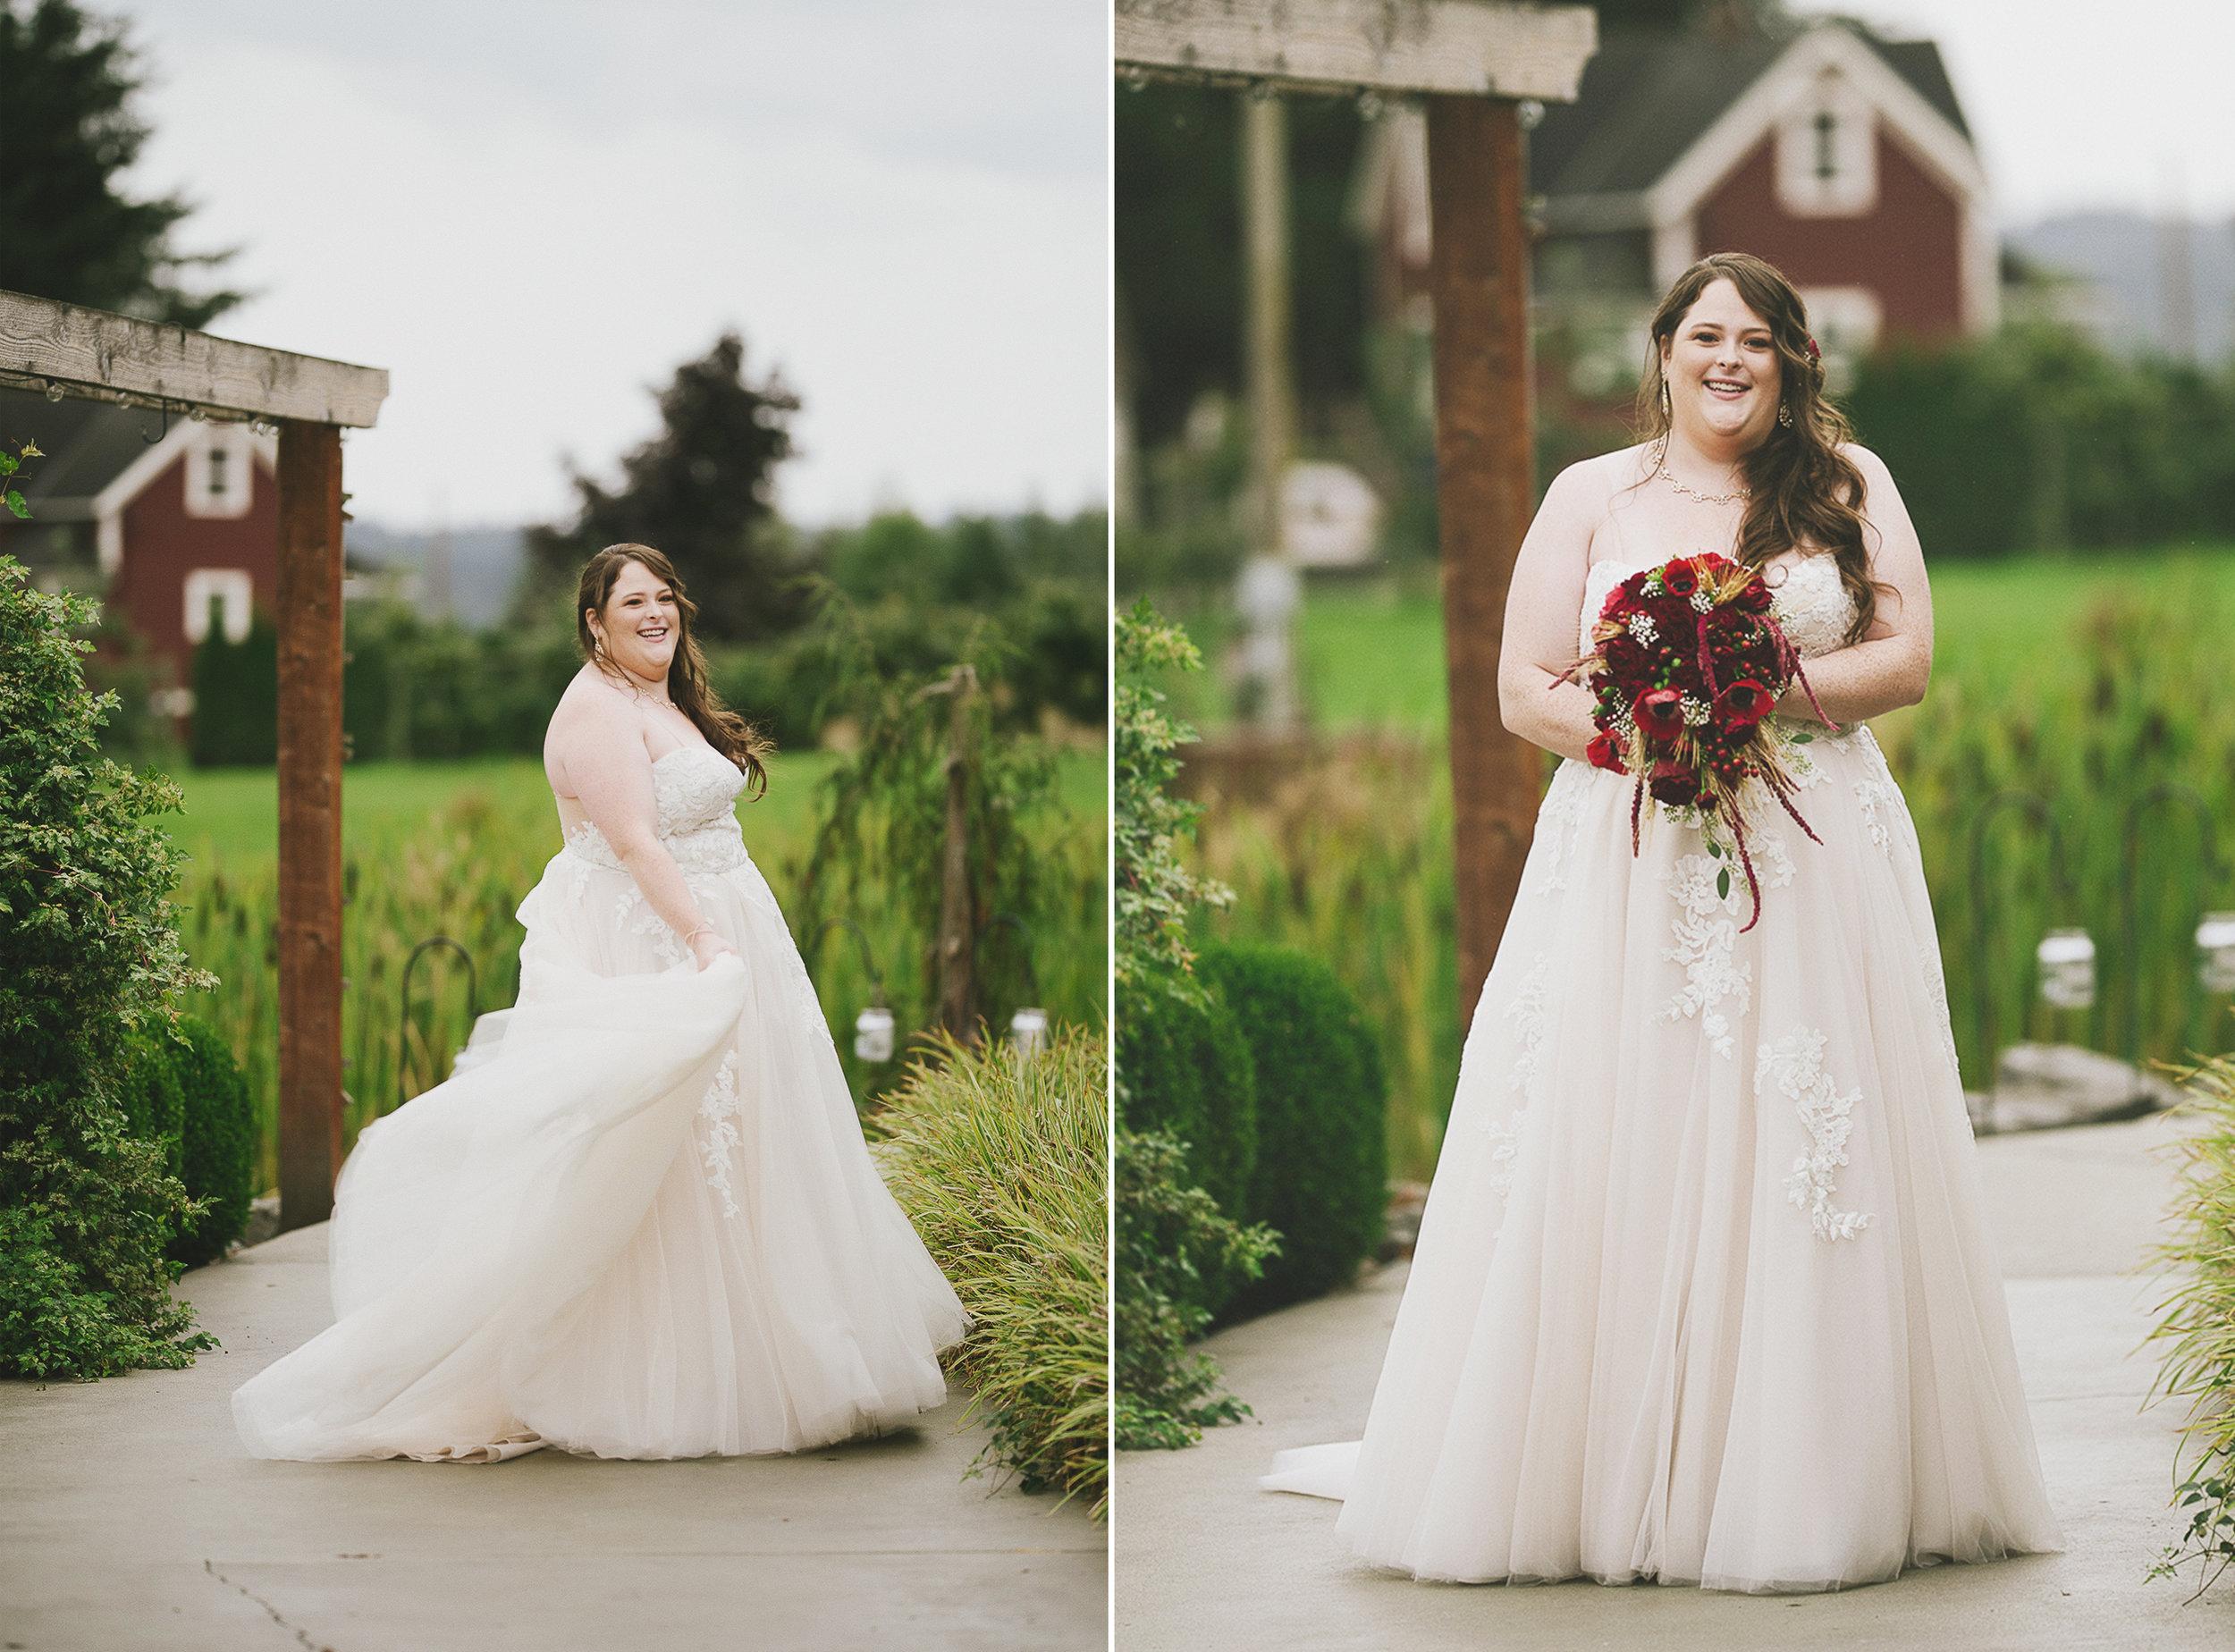 Swan Trail Farm Wedding_JBK Events_Snohomish Wedding_Sarah + Brian Bridal Composite.jpg